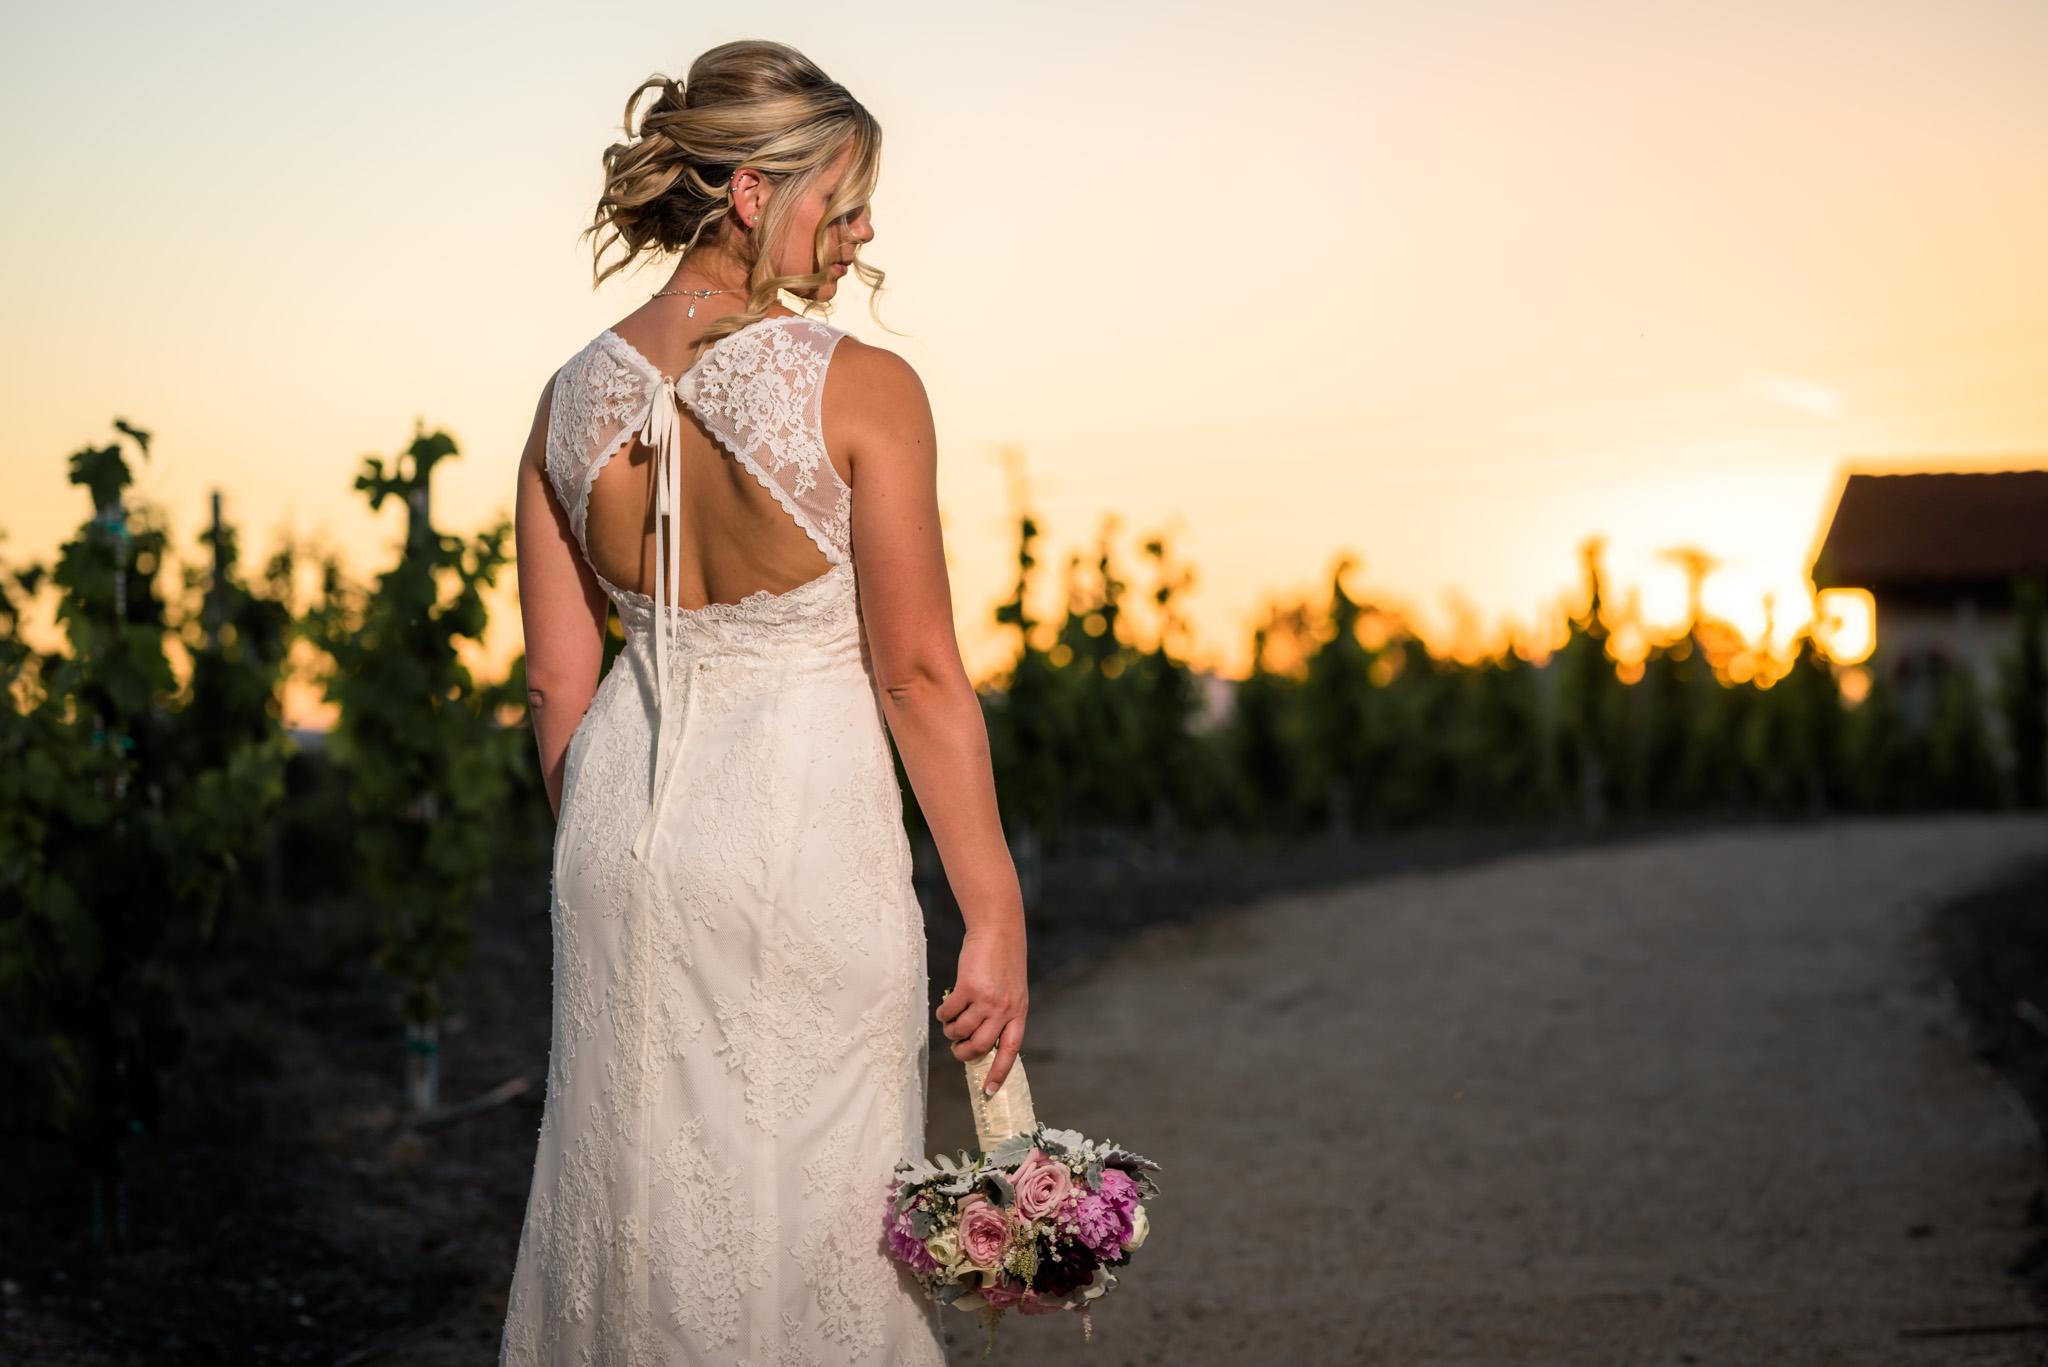 Avensole-Winery-Temecula-Wedding-Josh-and-Olivia-3824.JPG